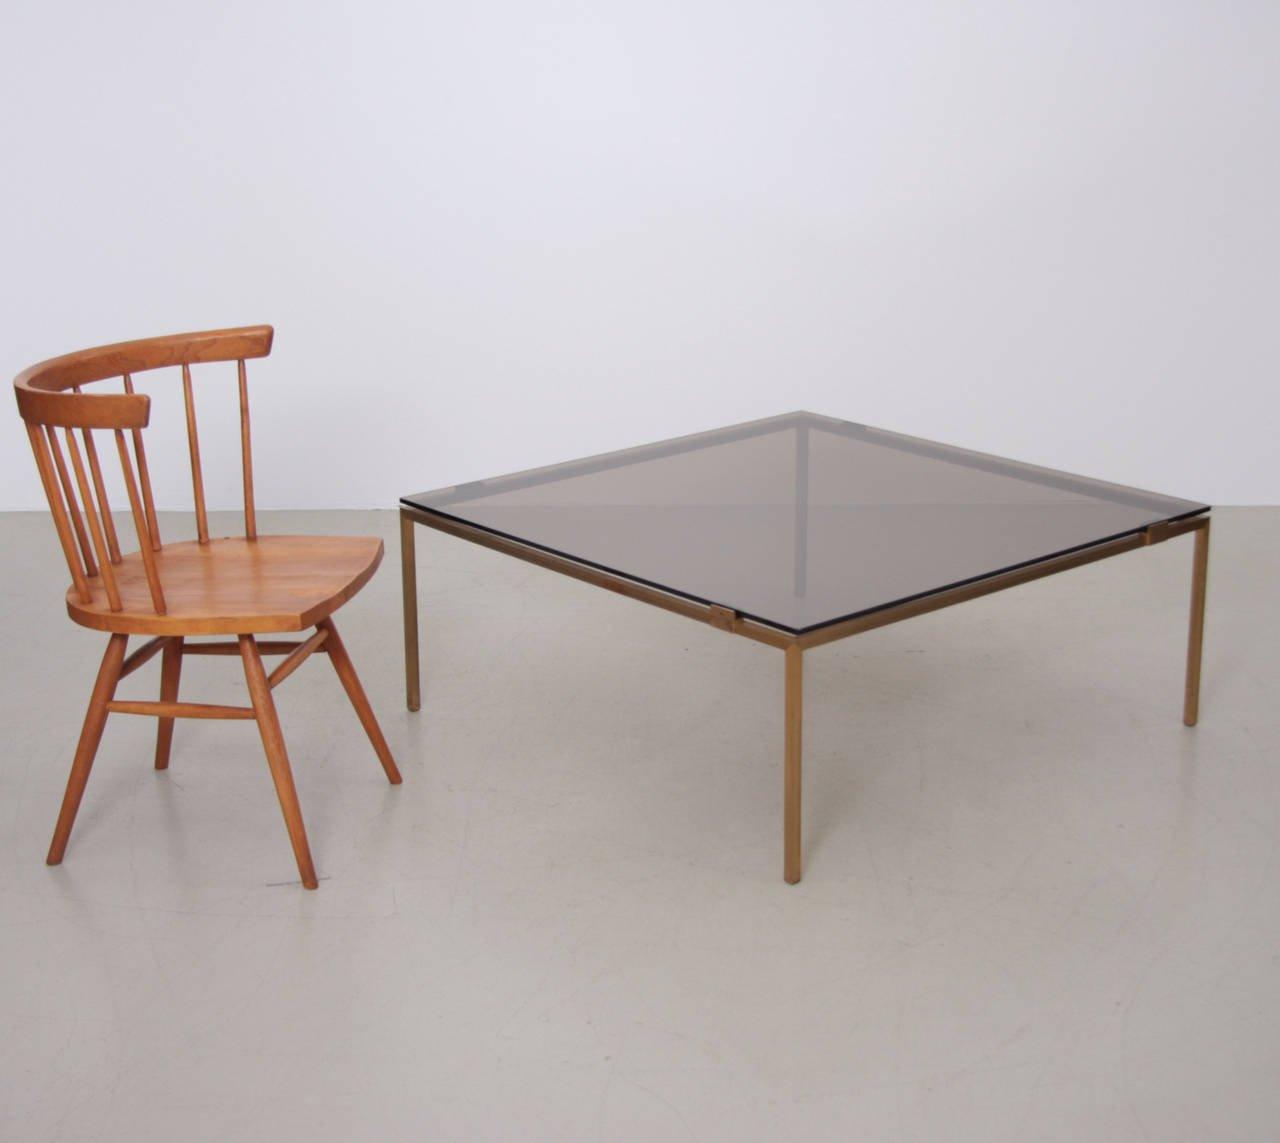 Elegant Glass And Metal Coffee Table: Elegant Brass And Glass Coffee Table In The Manner Of